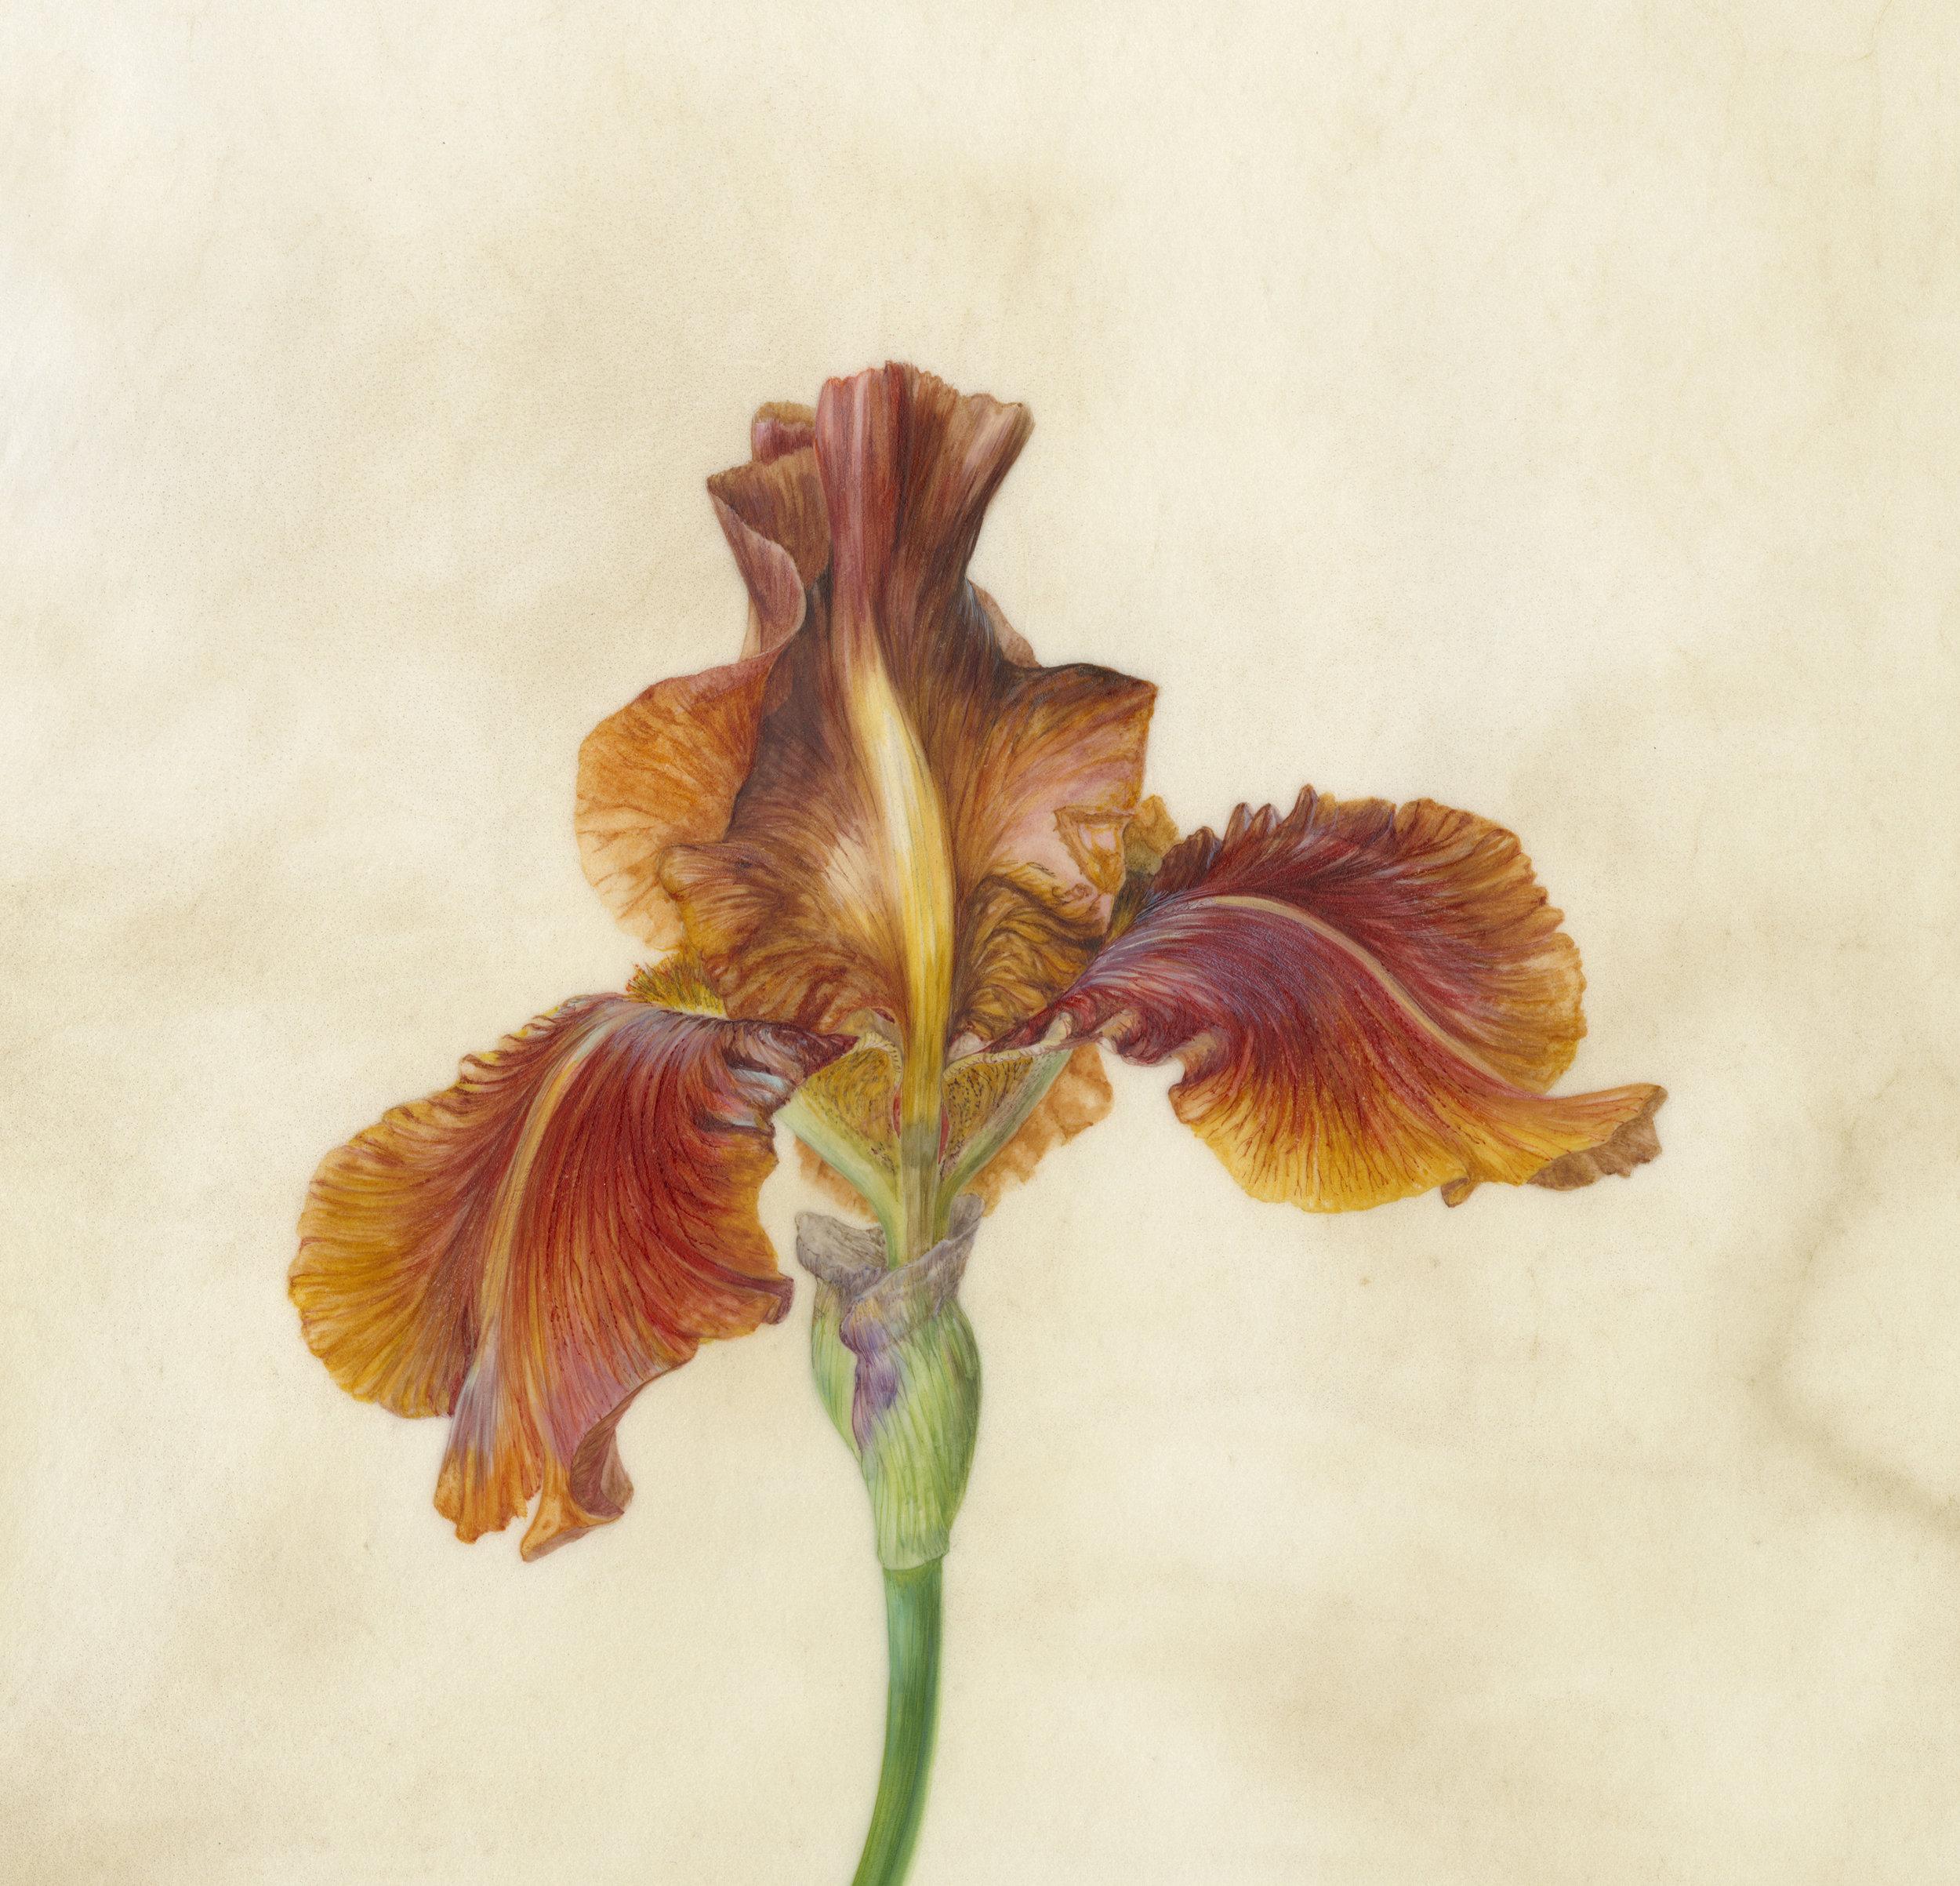 Iris Recogniton IV Benton Caramel  watercolour on vellum  45 x 45 cm framed  sold